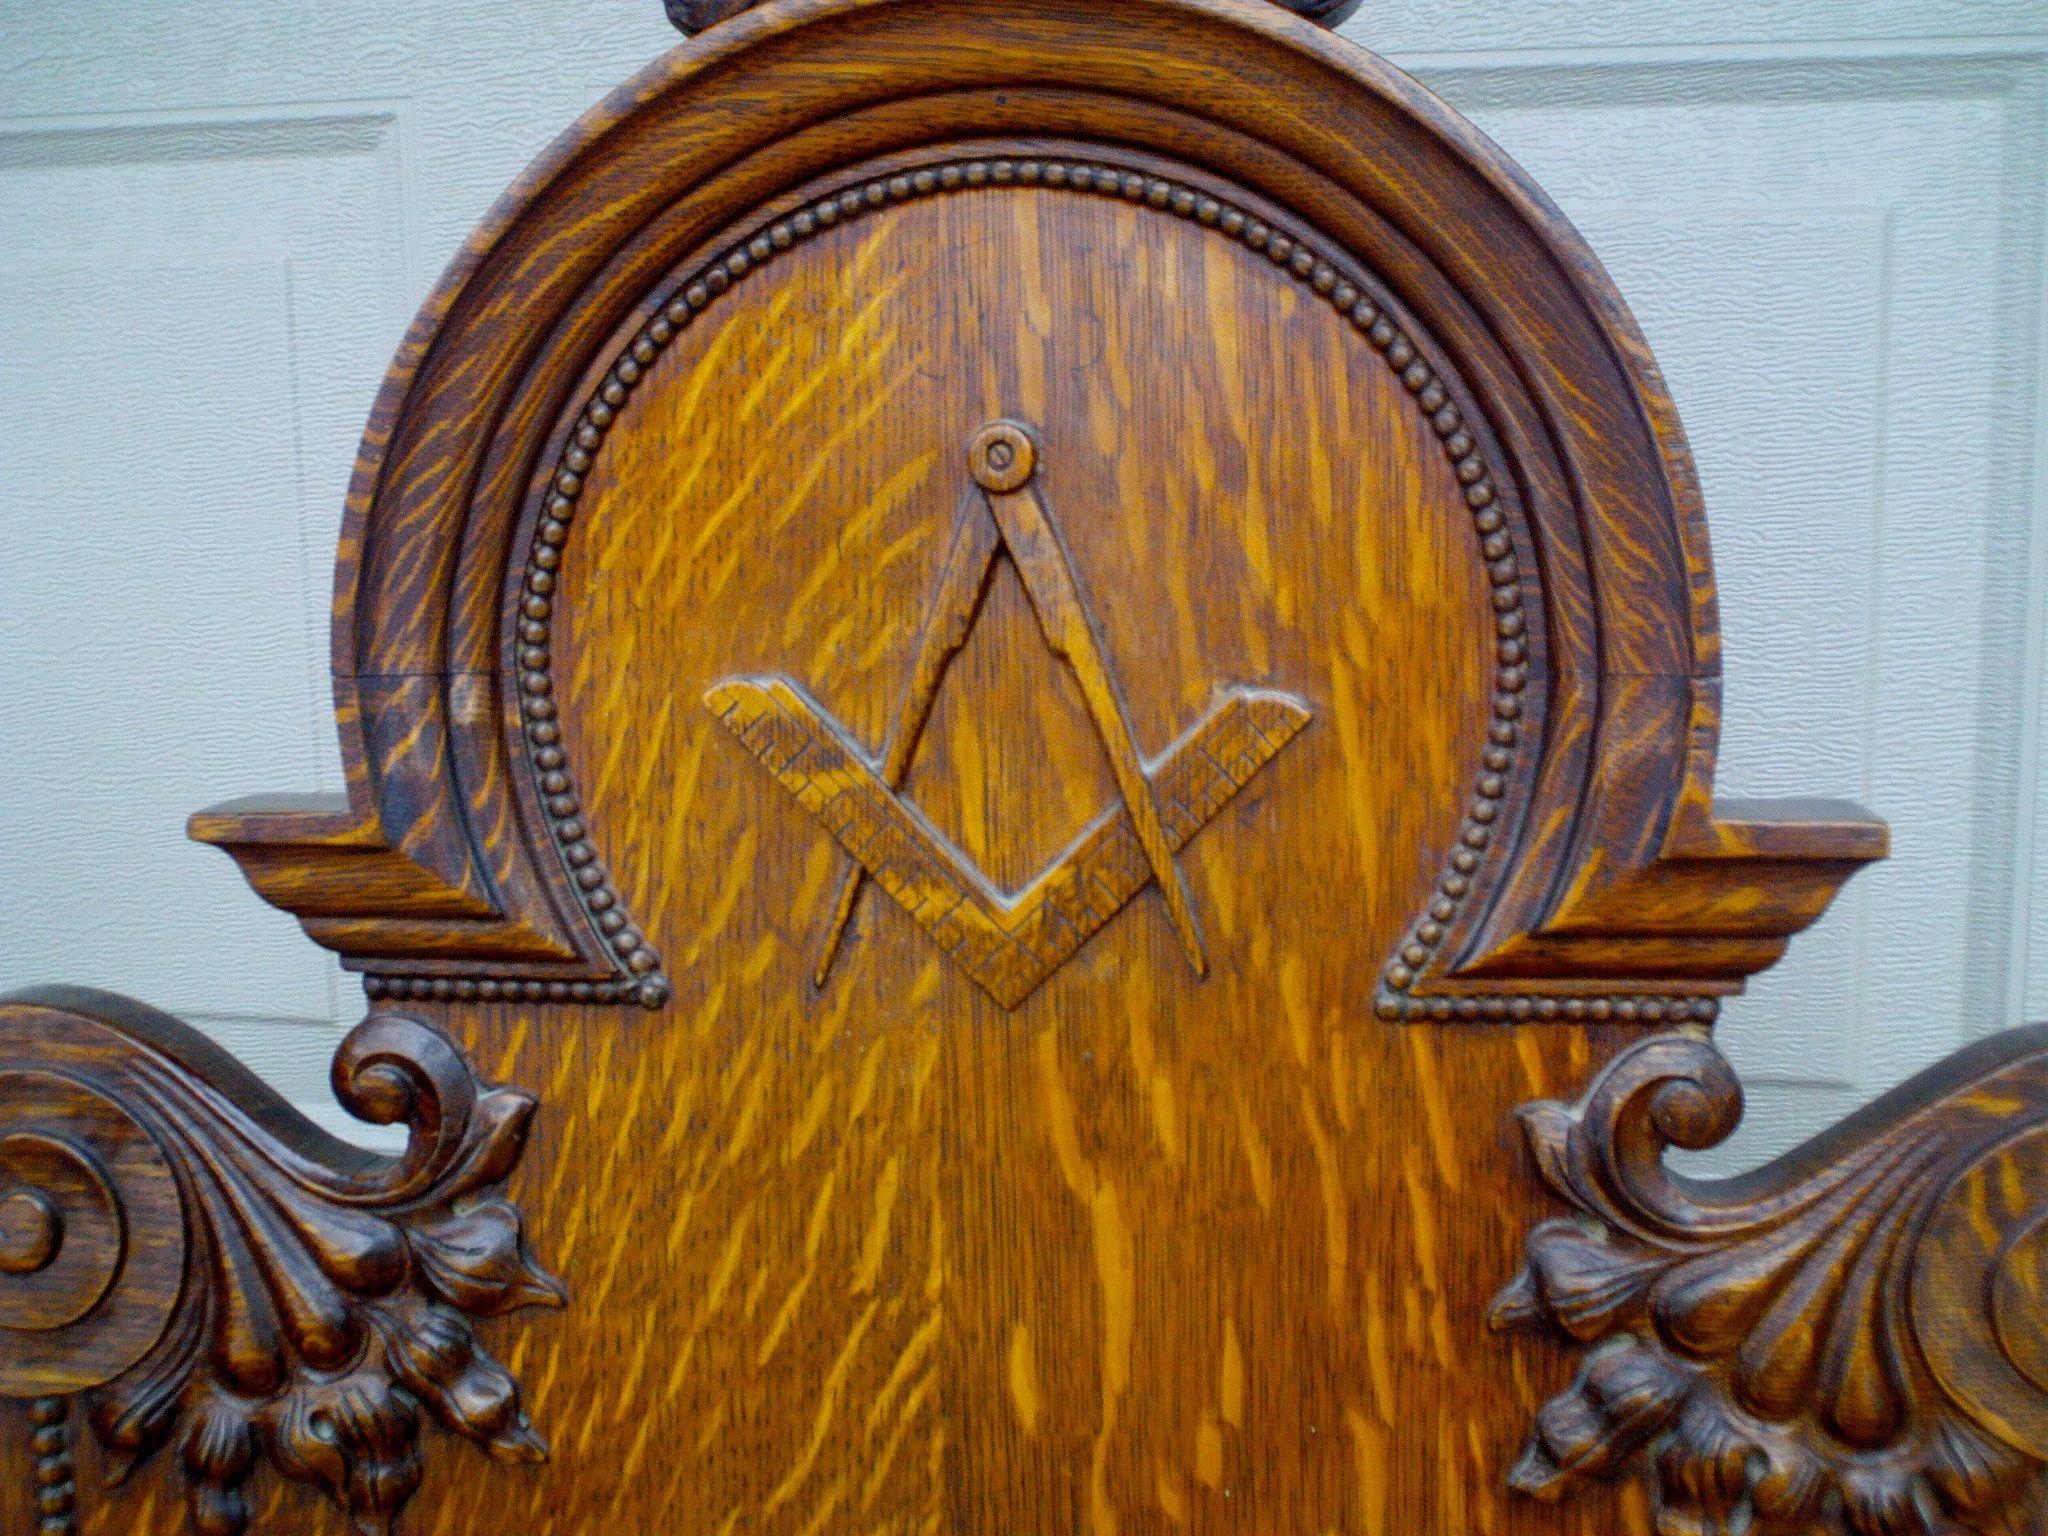 antique gothic ornate carved oak masonic chair for sale antiques antique gothic ornate carved oak masonic